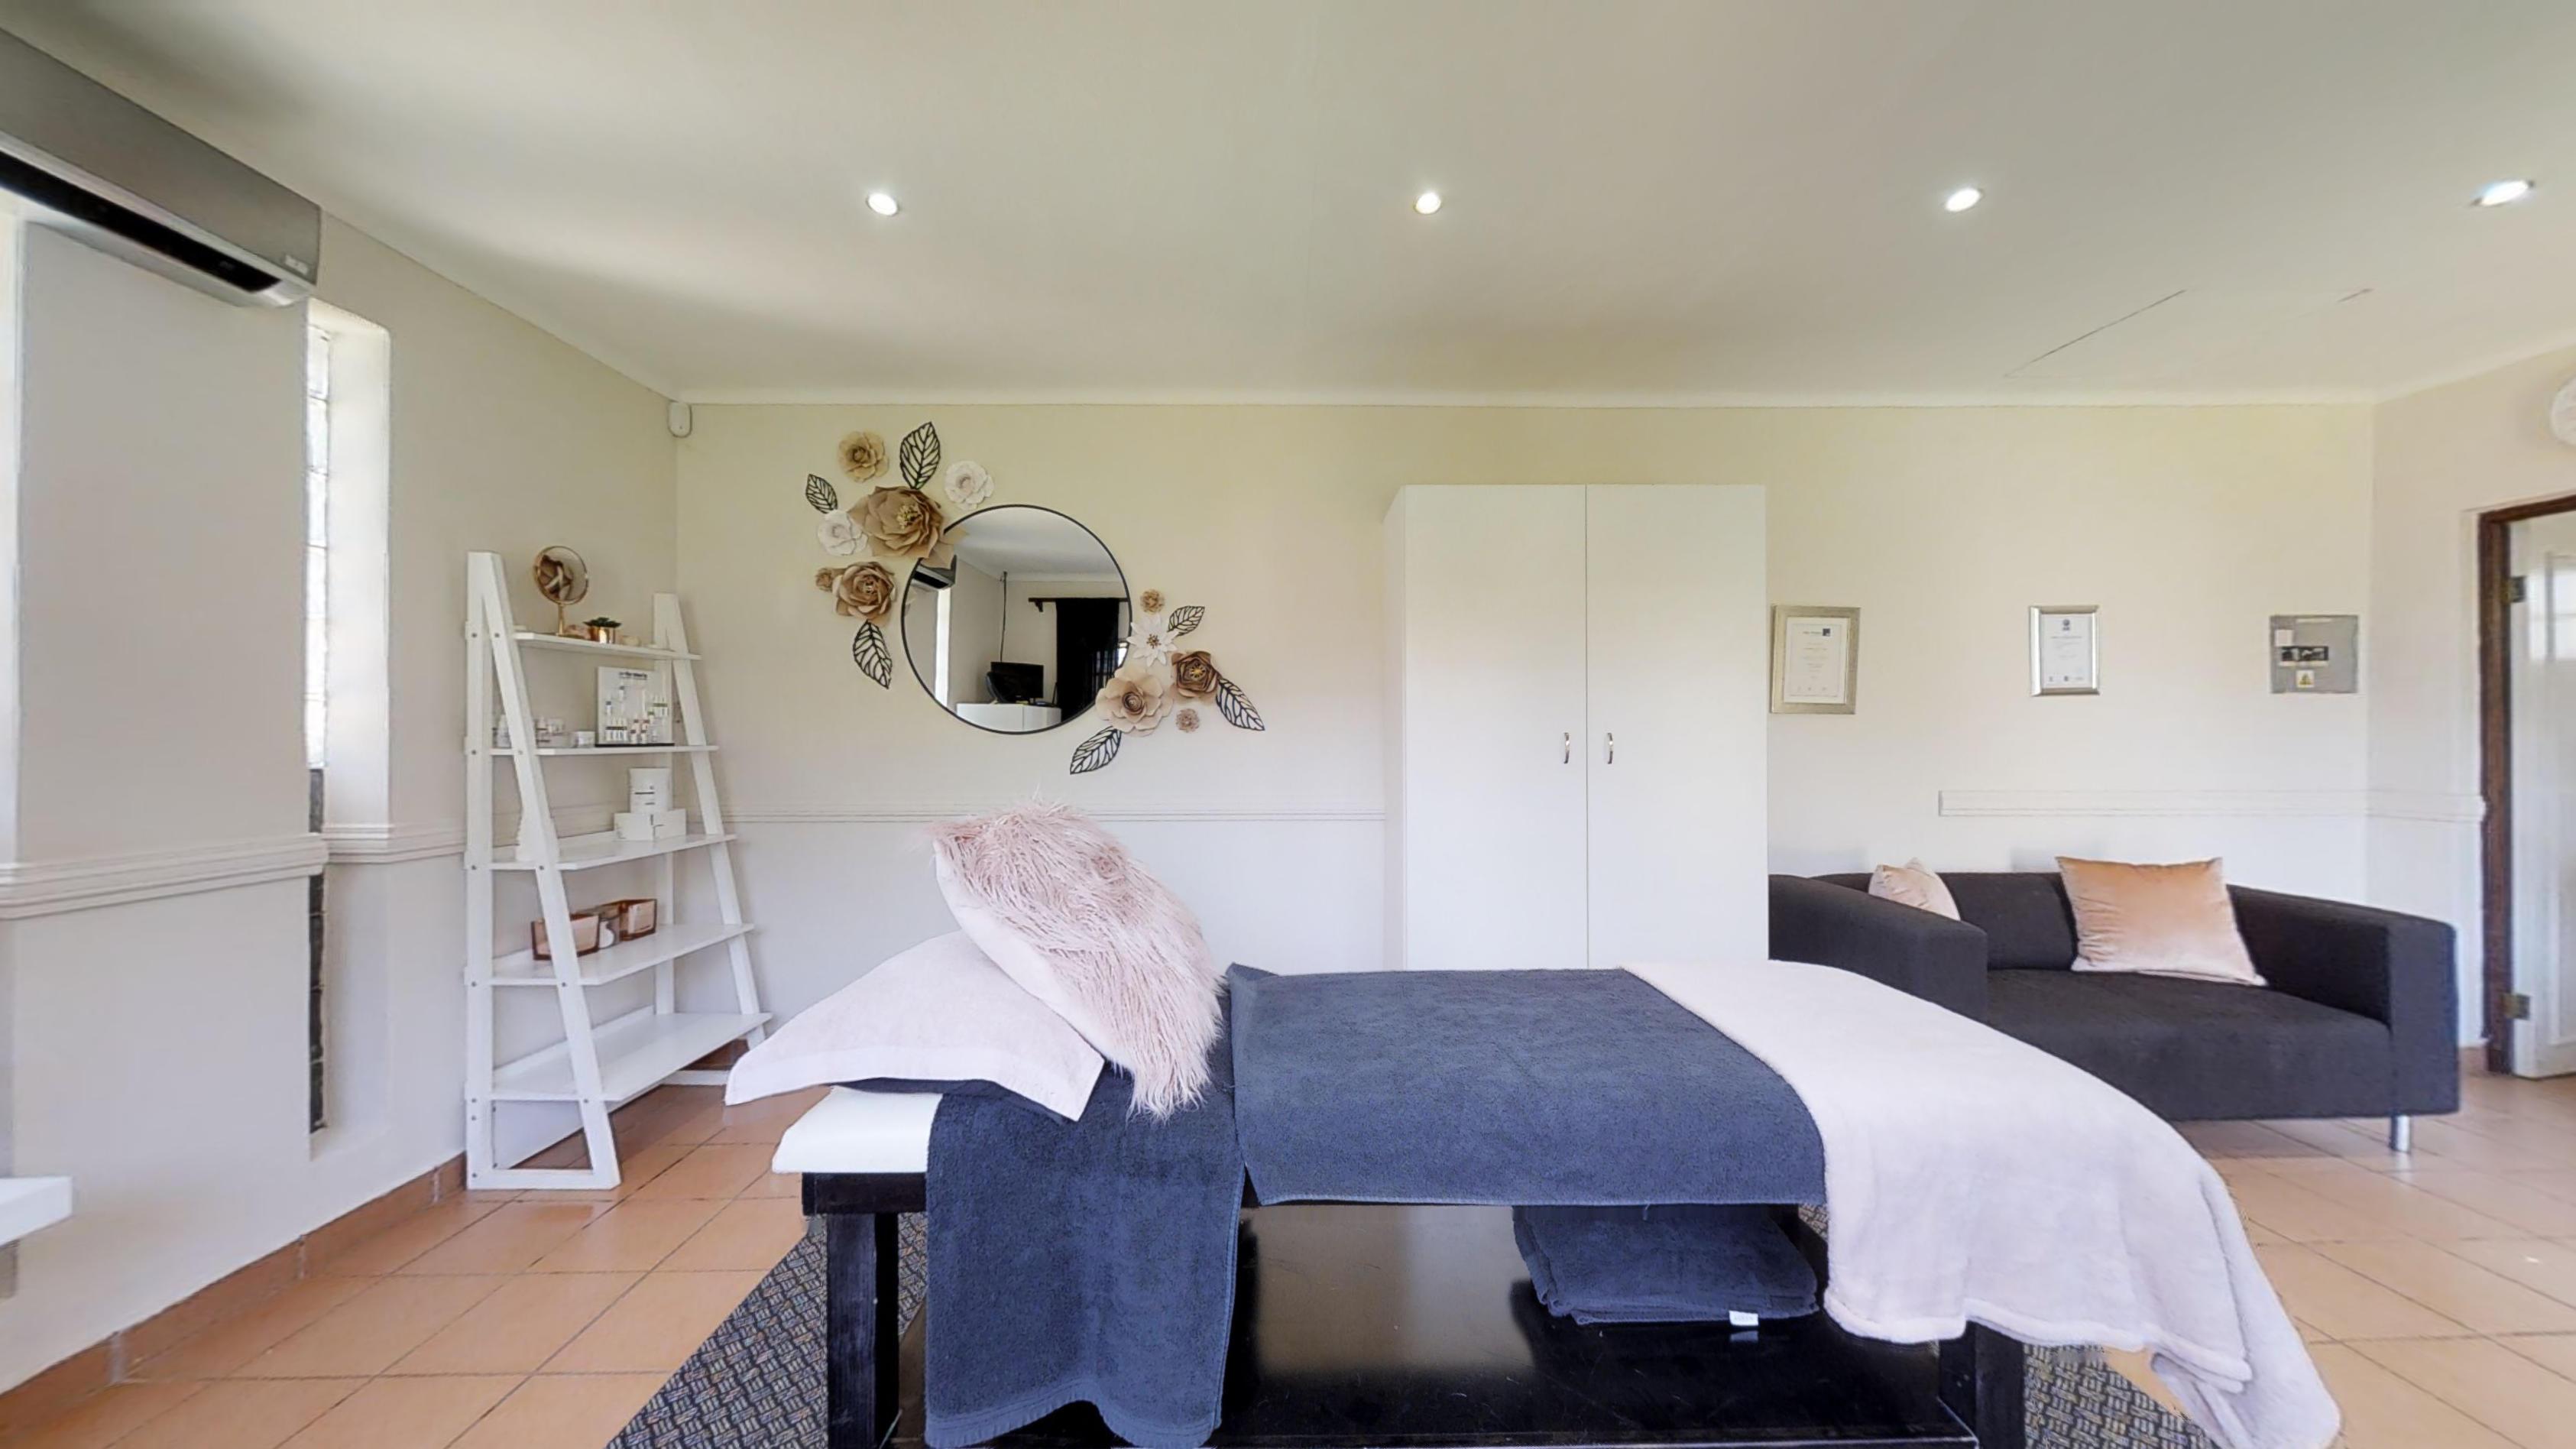 104 Derby, Gauteng, 3 Bedrooms Bedrooms, ,2 BathroomsBathrooms,House,For sale,Derby,1042